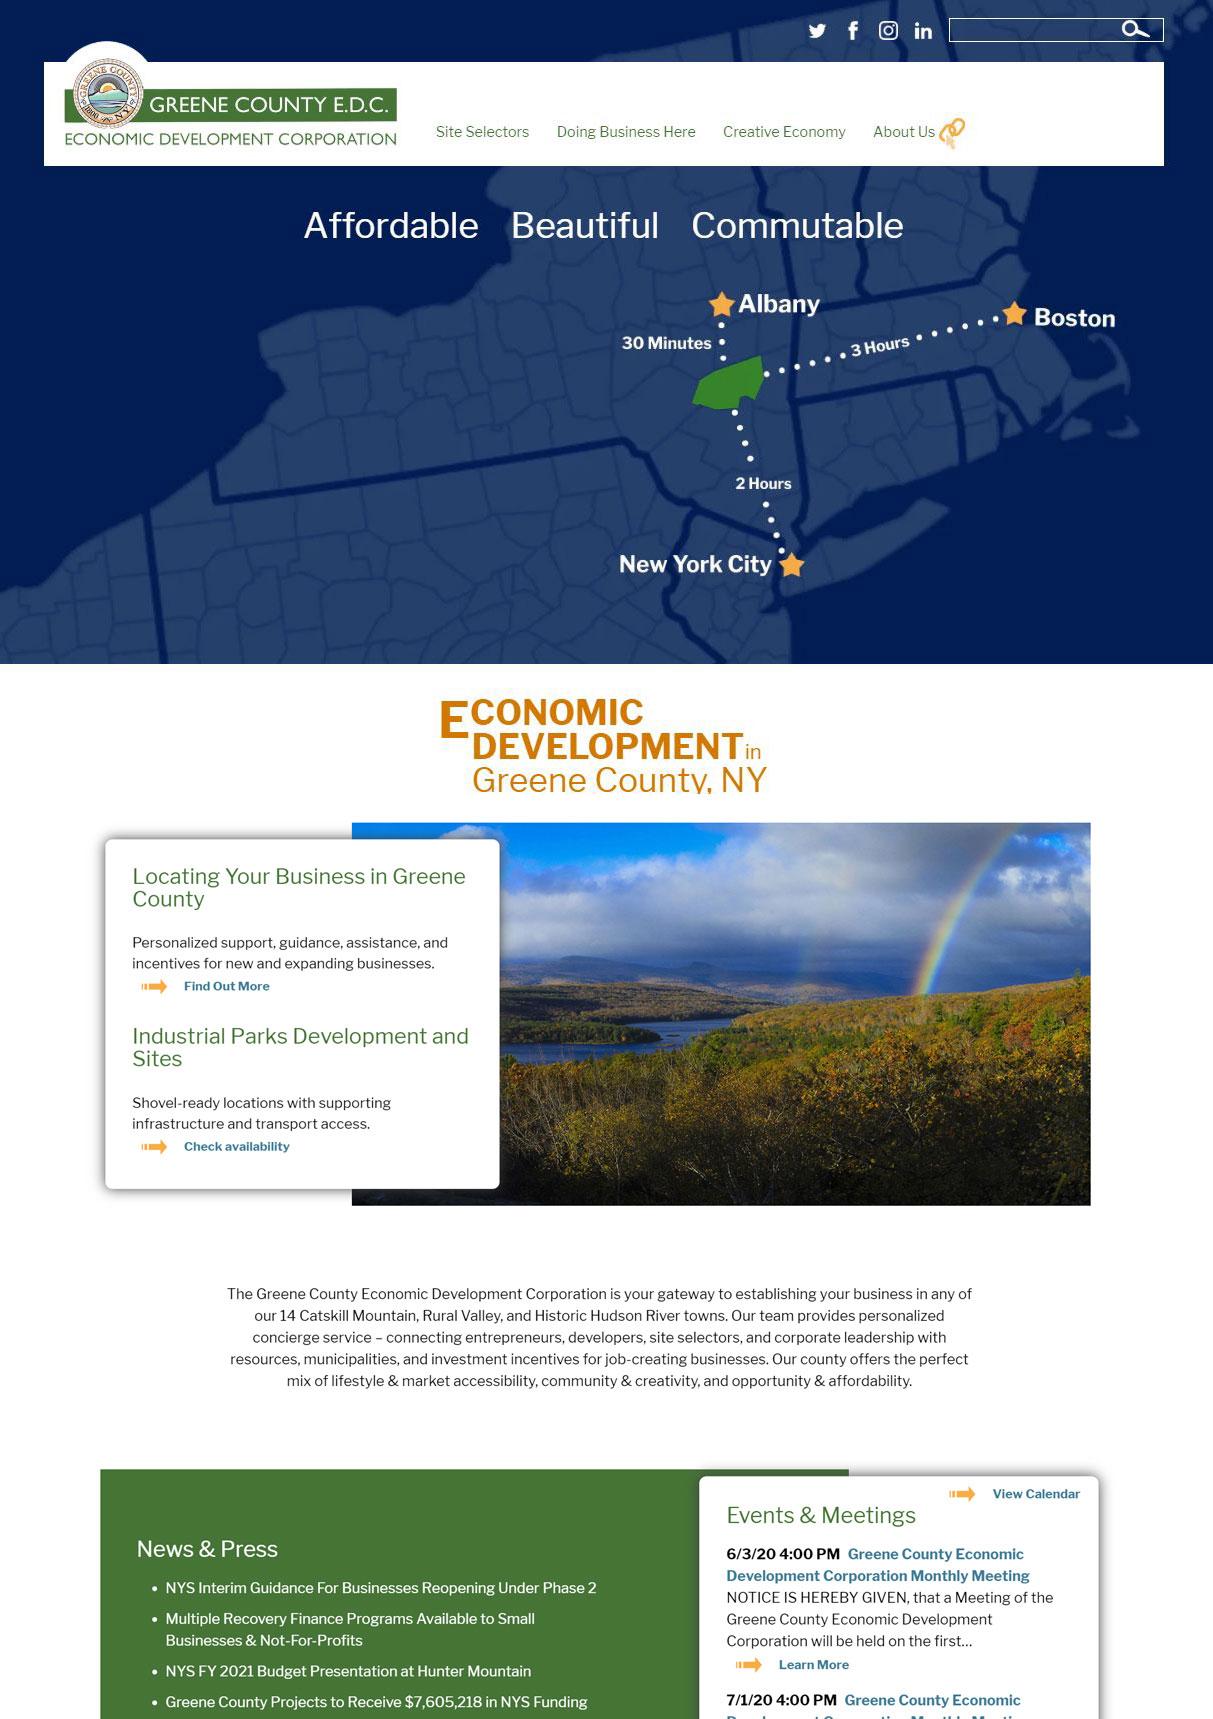 Greene County Economic Development Home Page